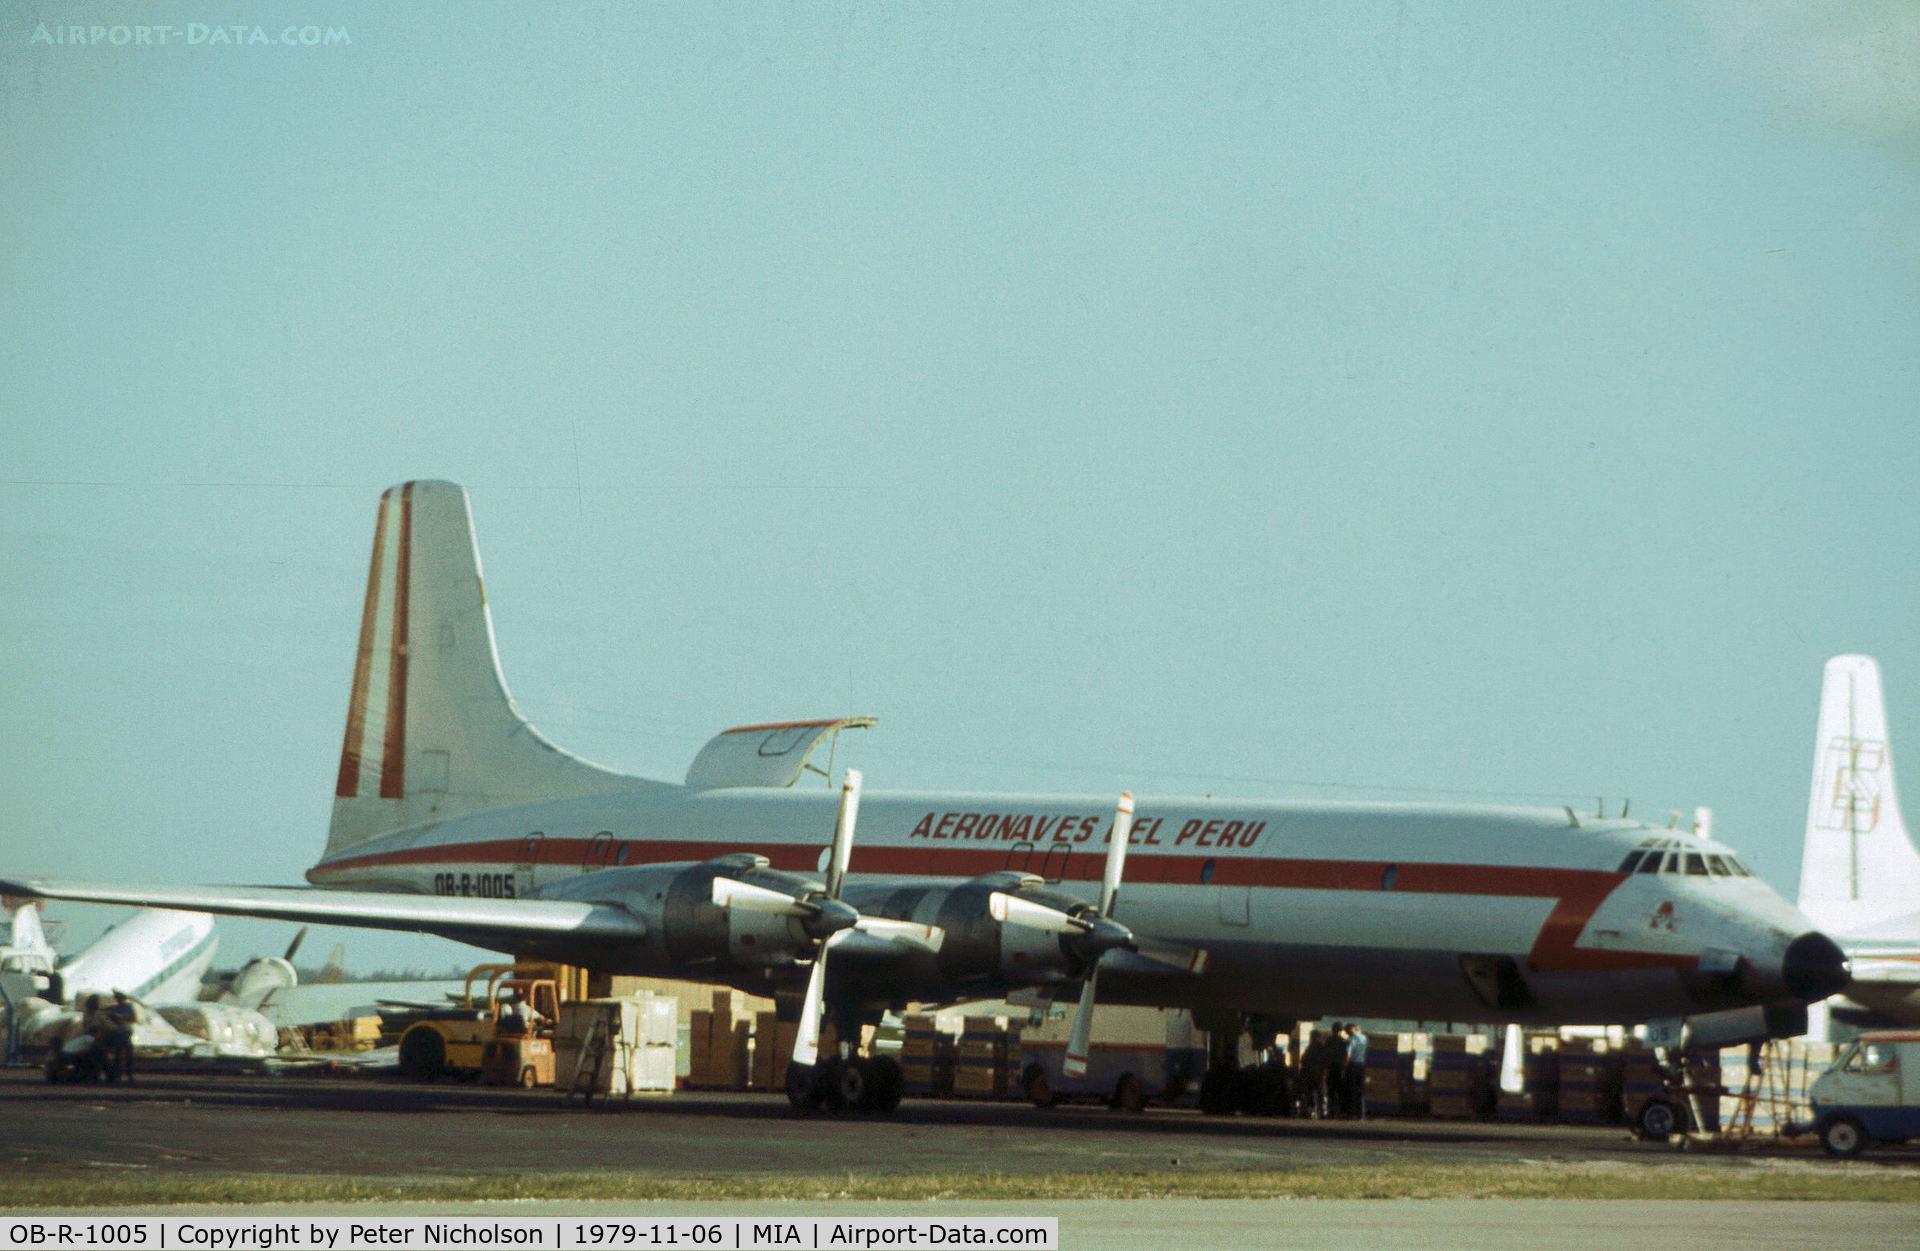 OB-R-1005, 1960 Canadair CL-44-6 (CC-106 Yukon) C/N 6, CL-44-D6 of Aeronaves del Peru as seen at Miami in November 1979.